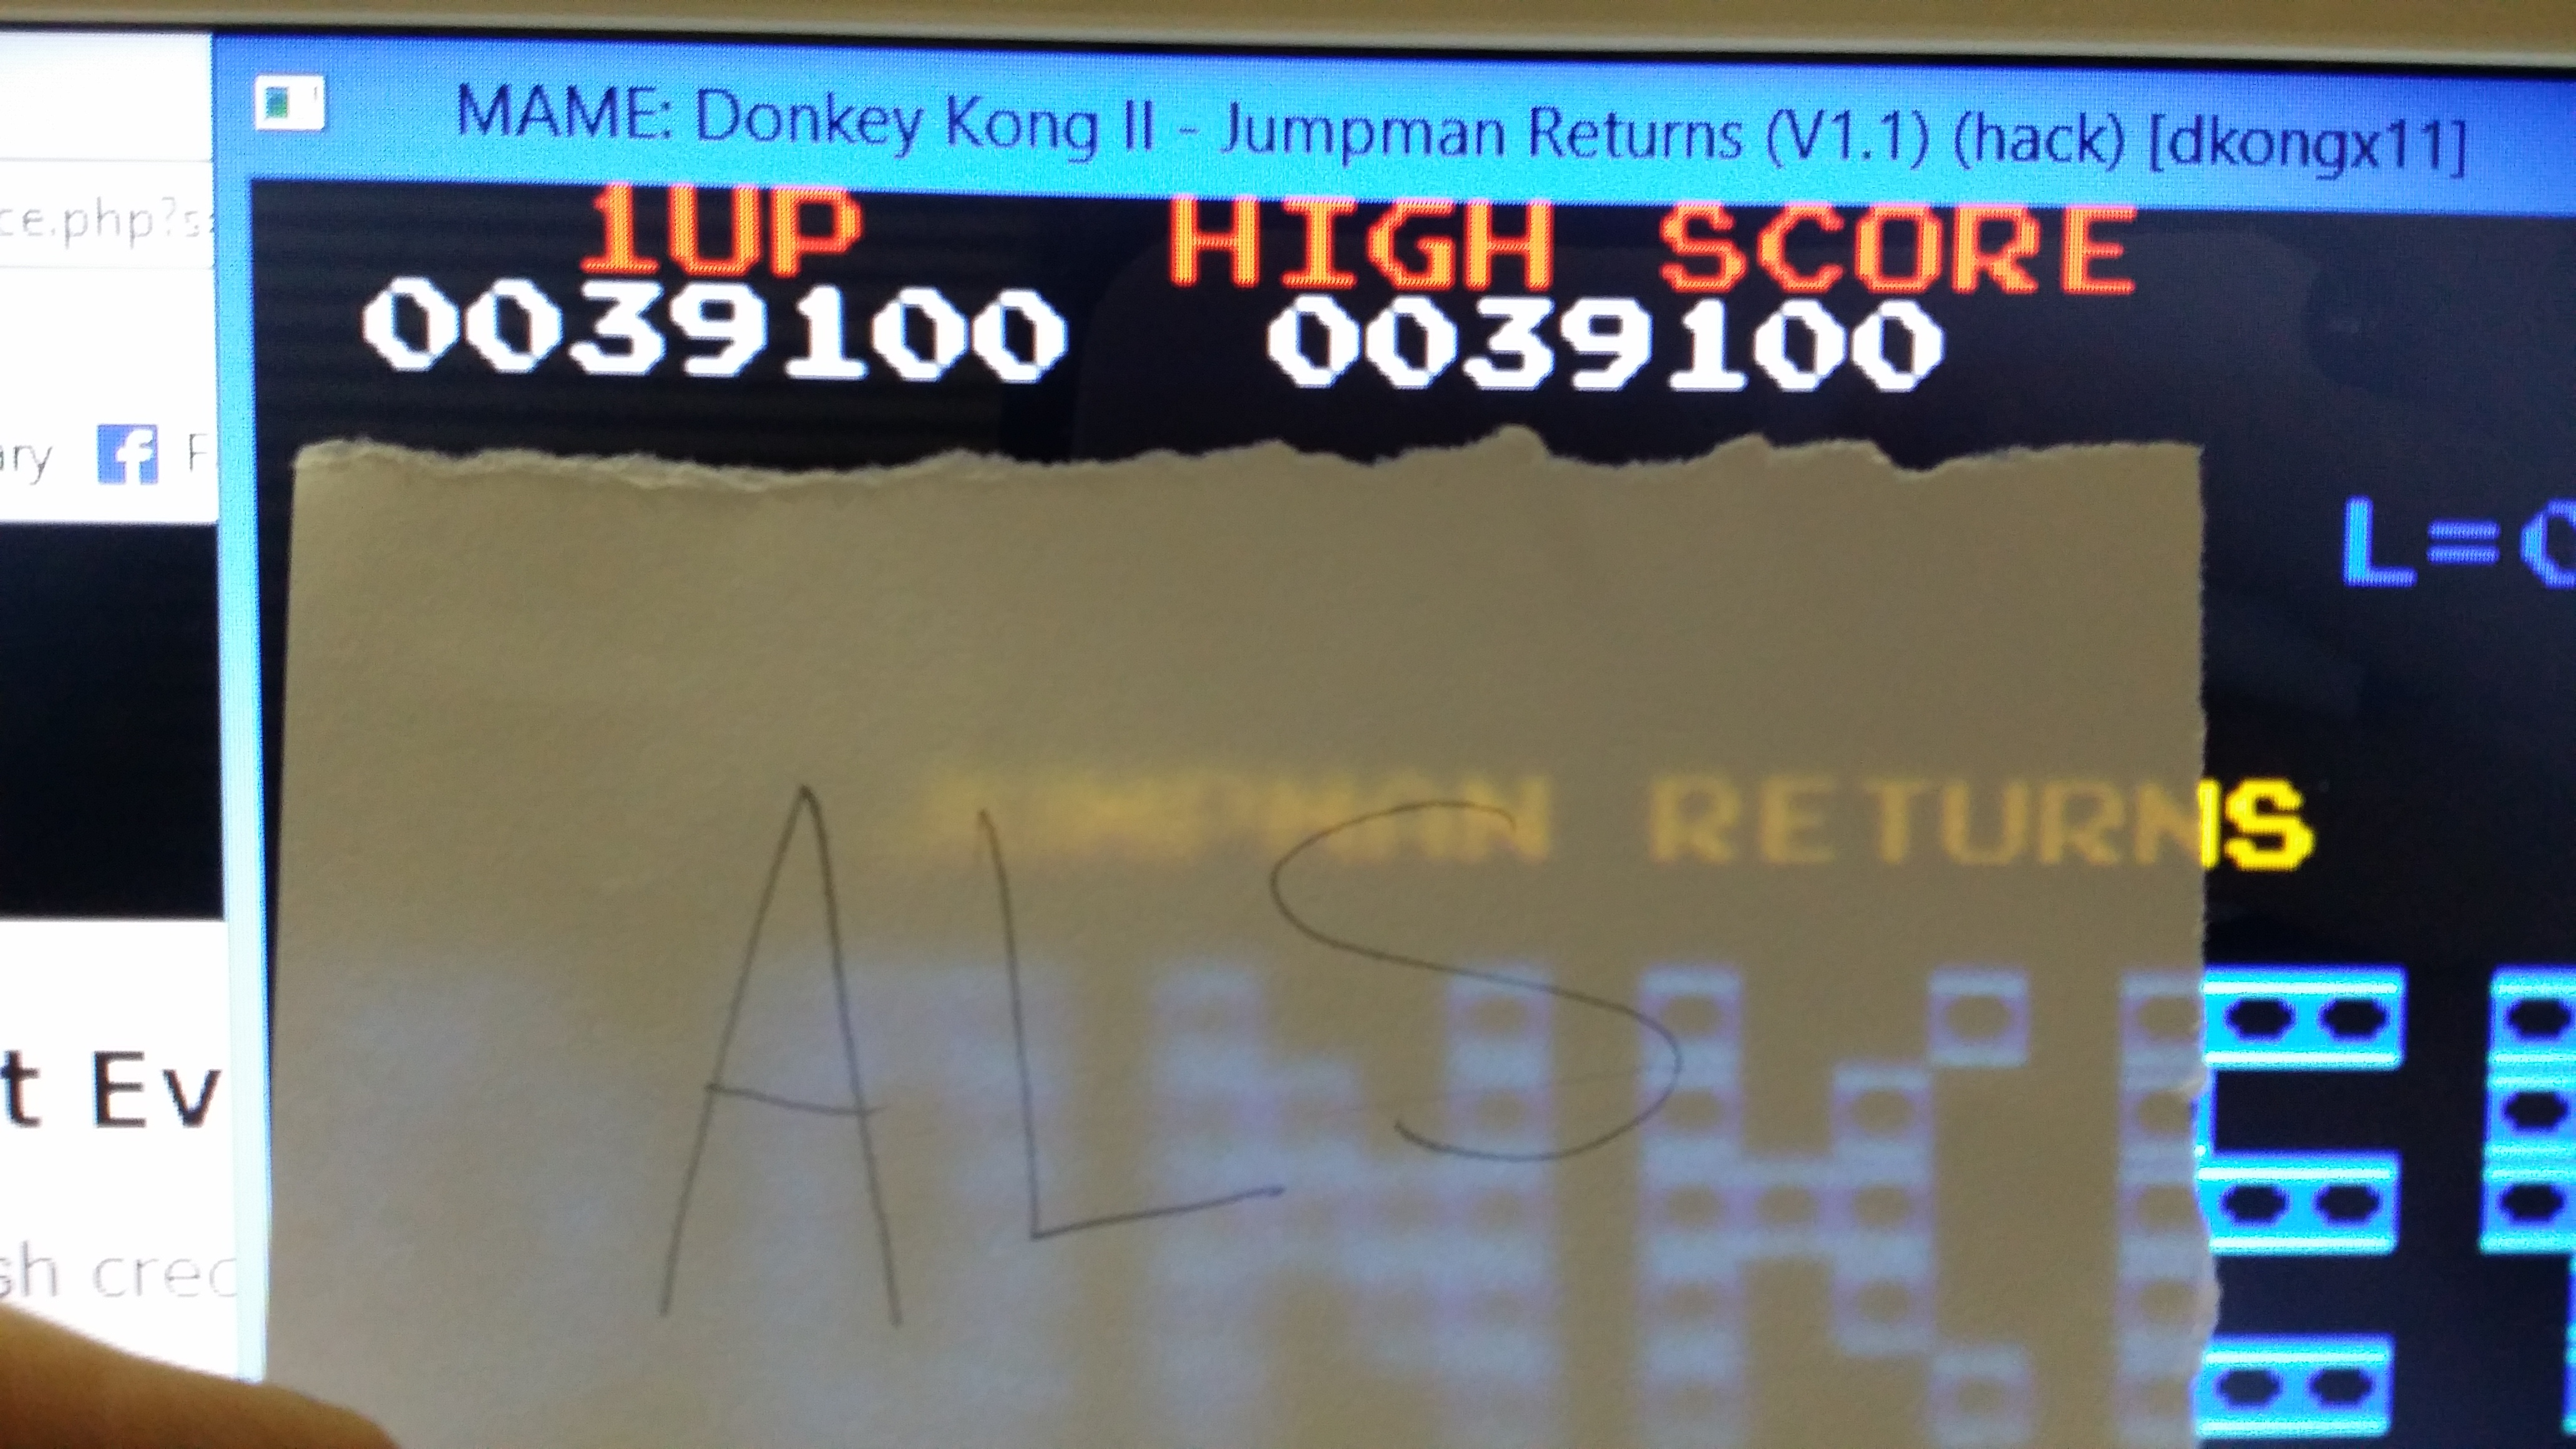 Donkey Kong 2 Jumpman Returns